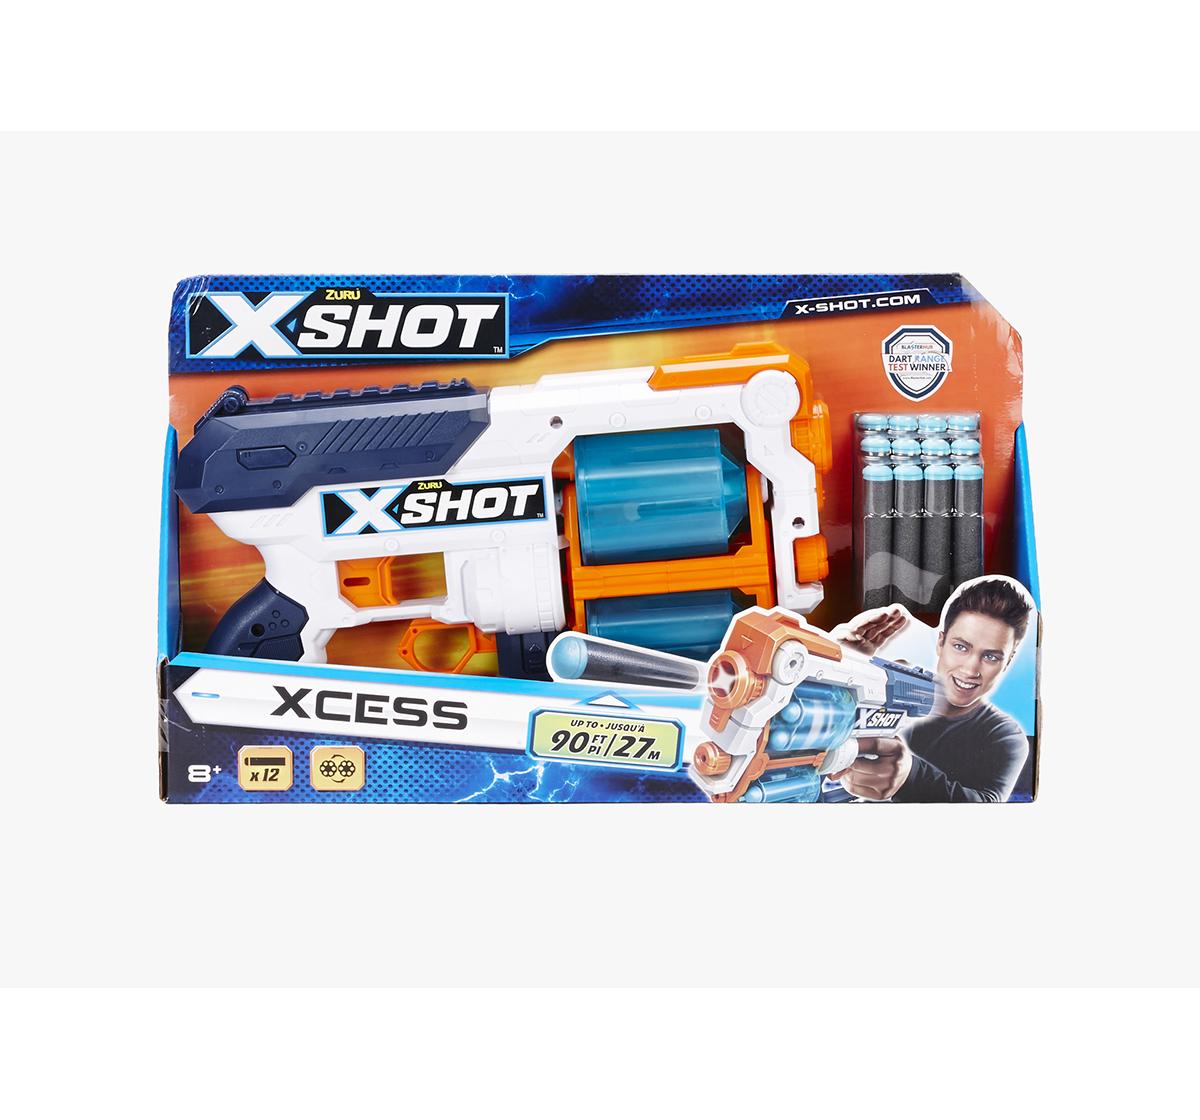 X-Shot | X-Shot Excel Plastic Xcess Tk 12 Blasters for Kids age 8Y+